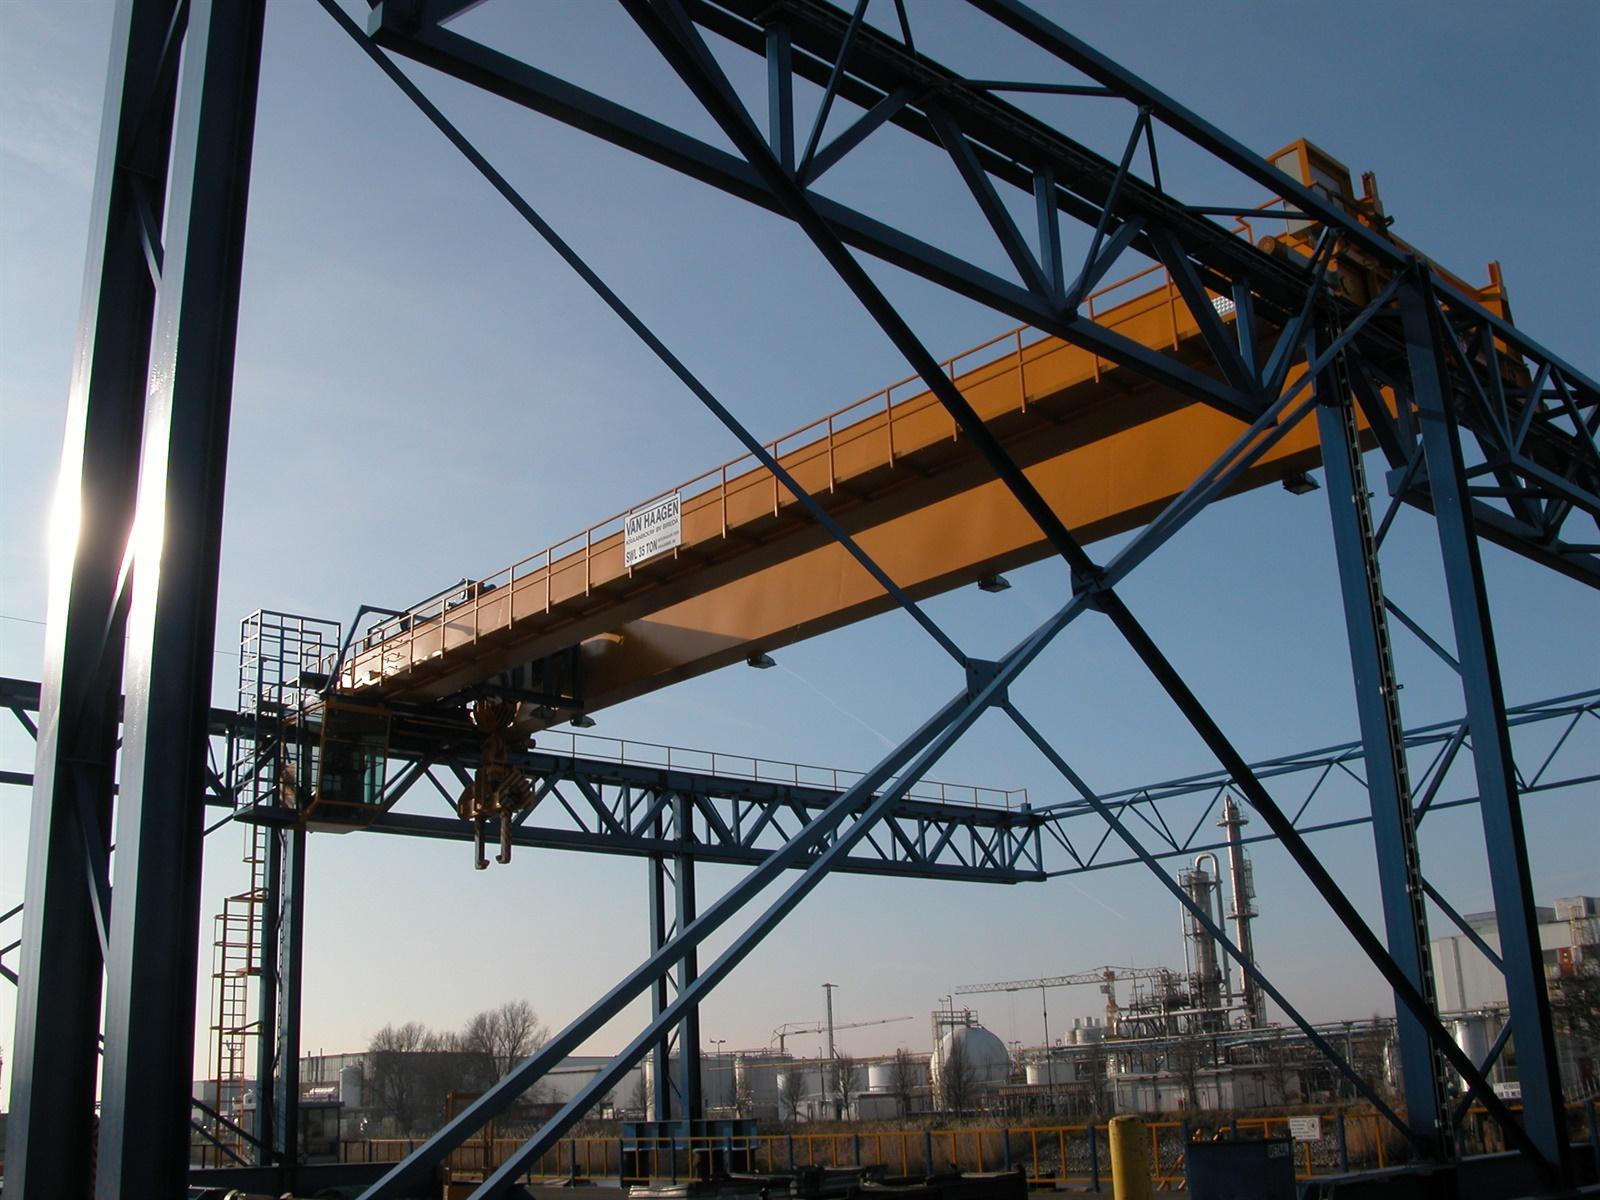 Overhead Cranes Europe : Overhead cranes references